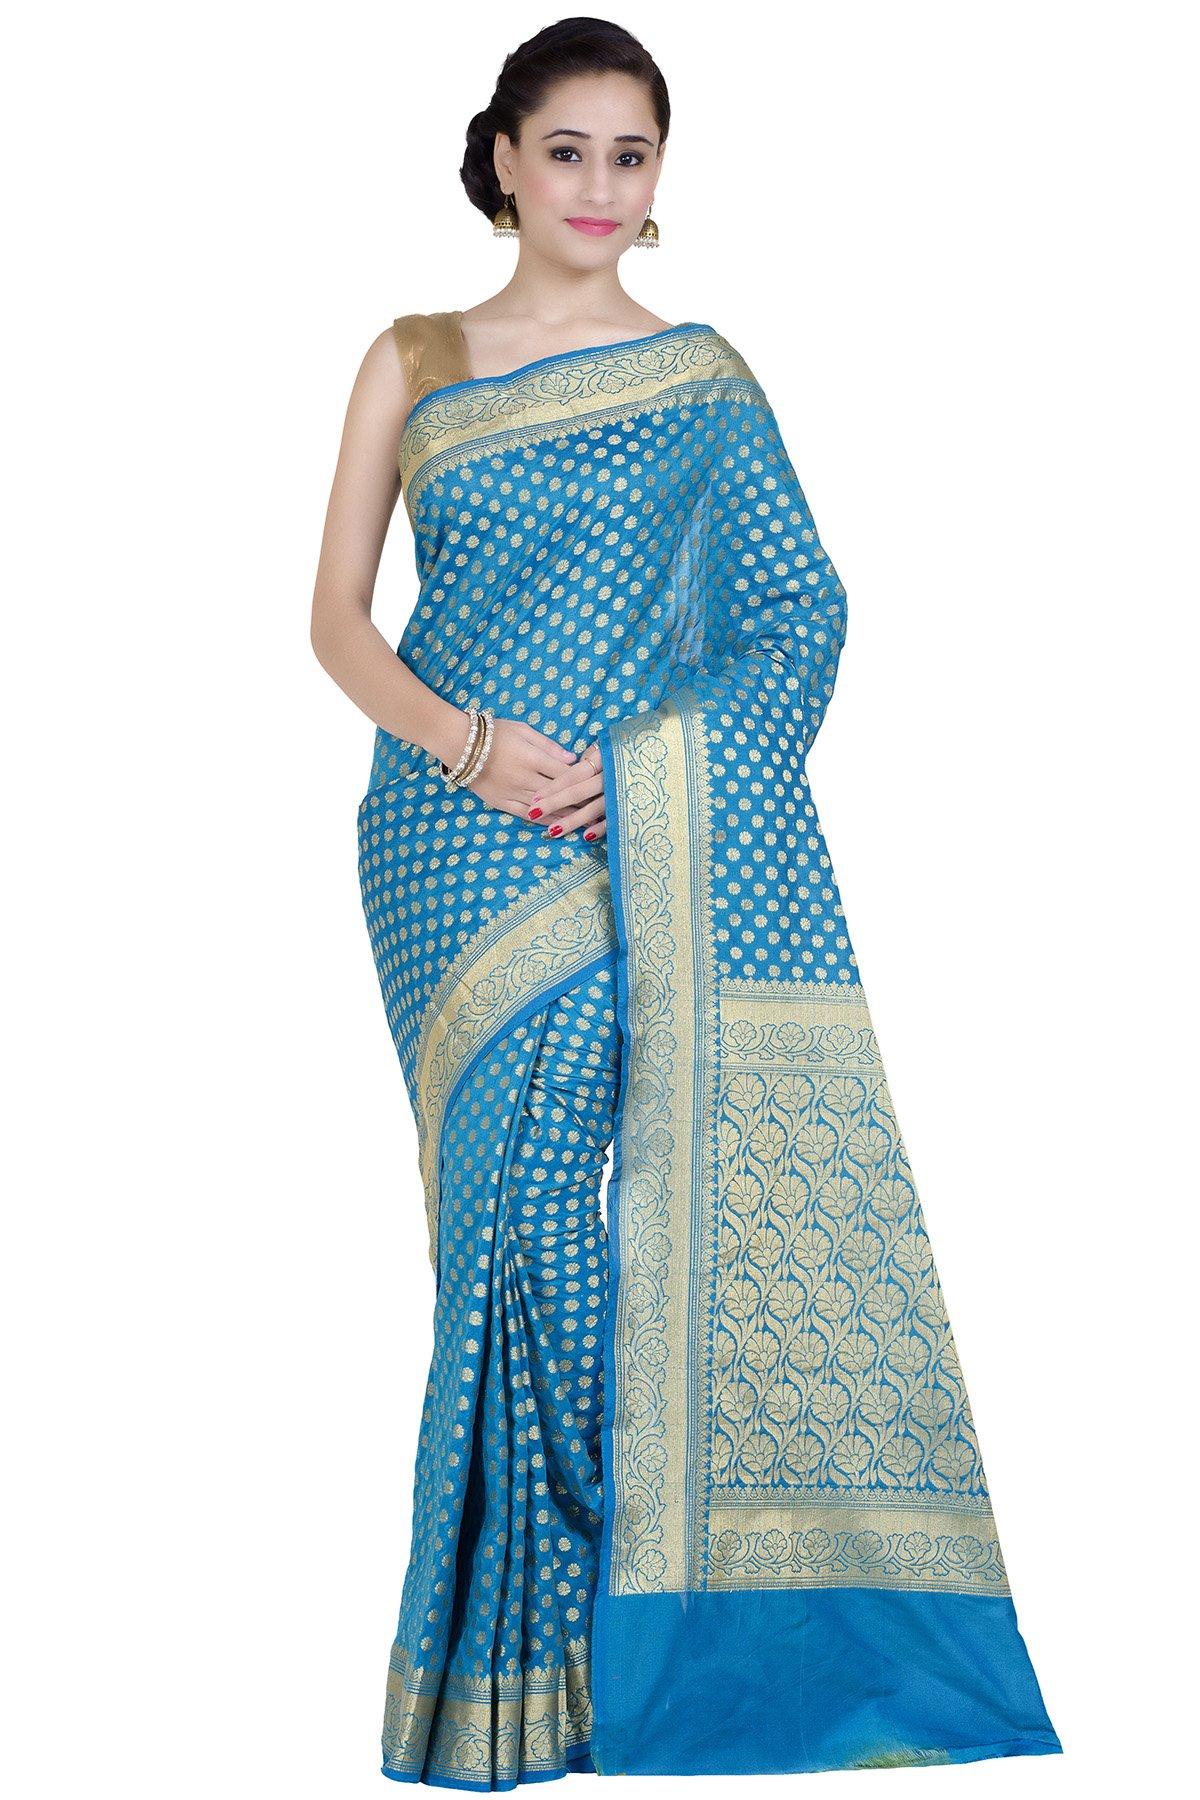 Chandrakala Women's Blue Kataan Silk Blend Banarasi Saree(1268BLU)